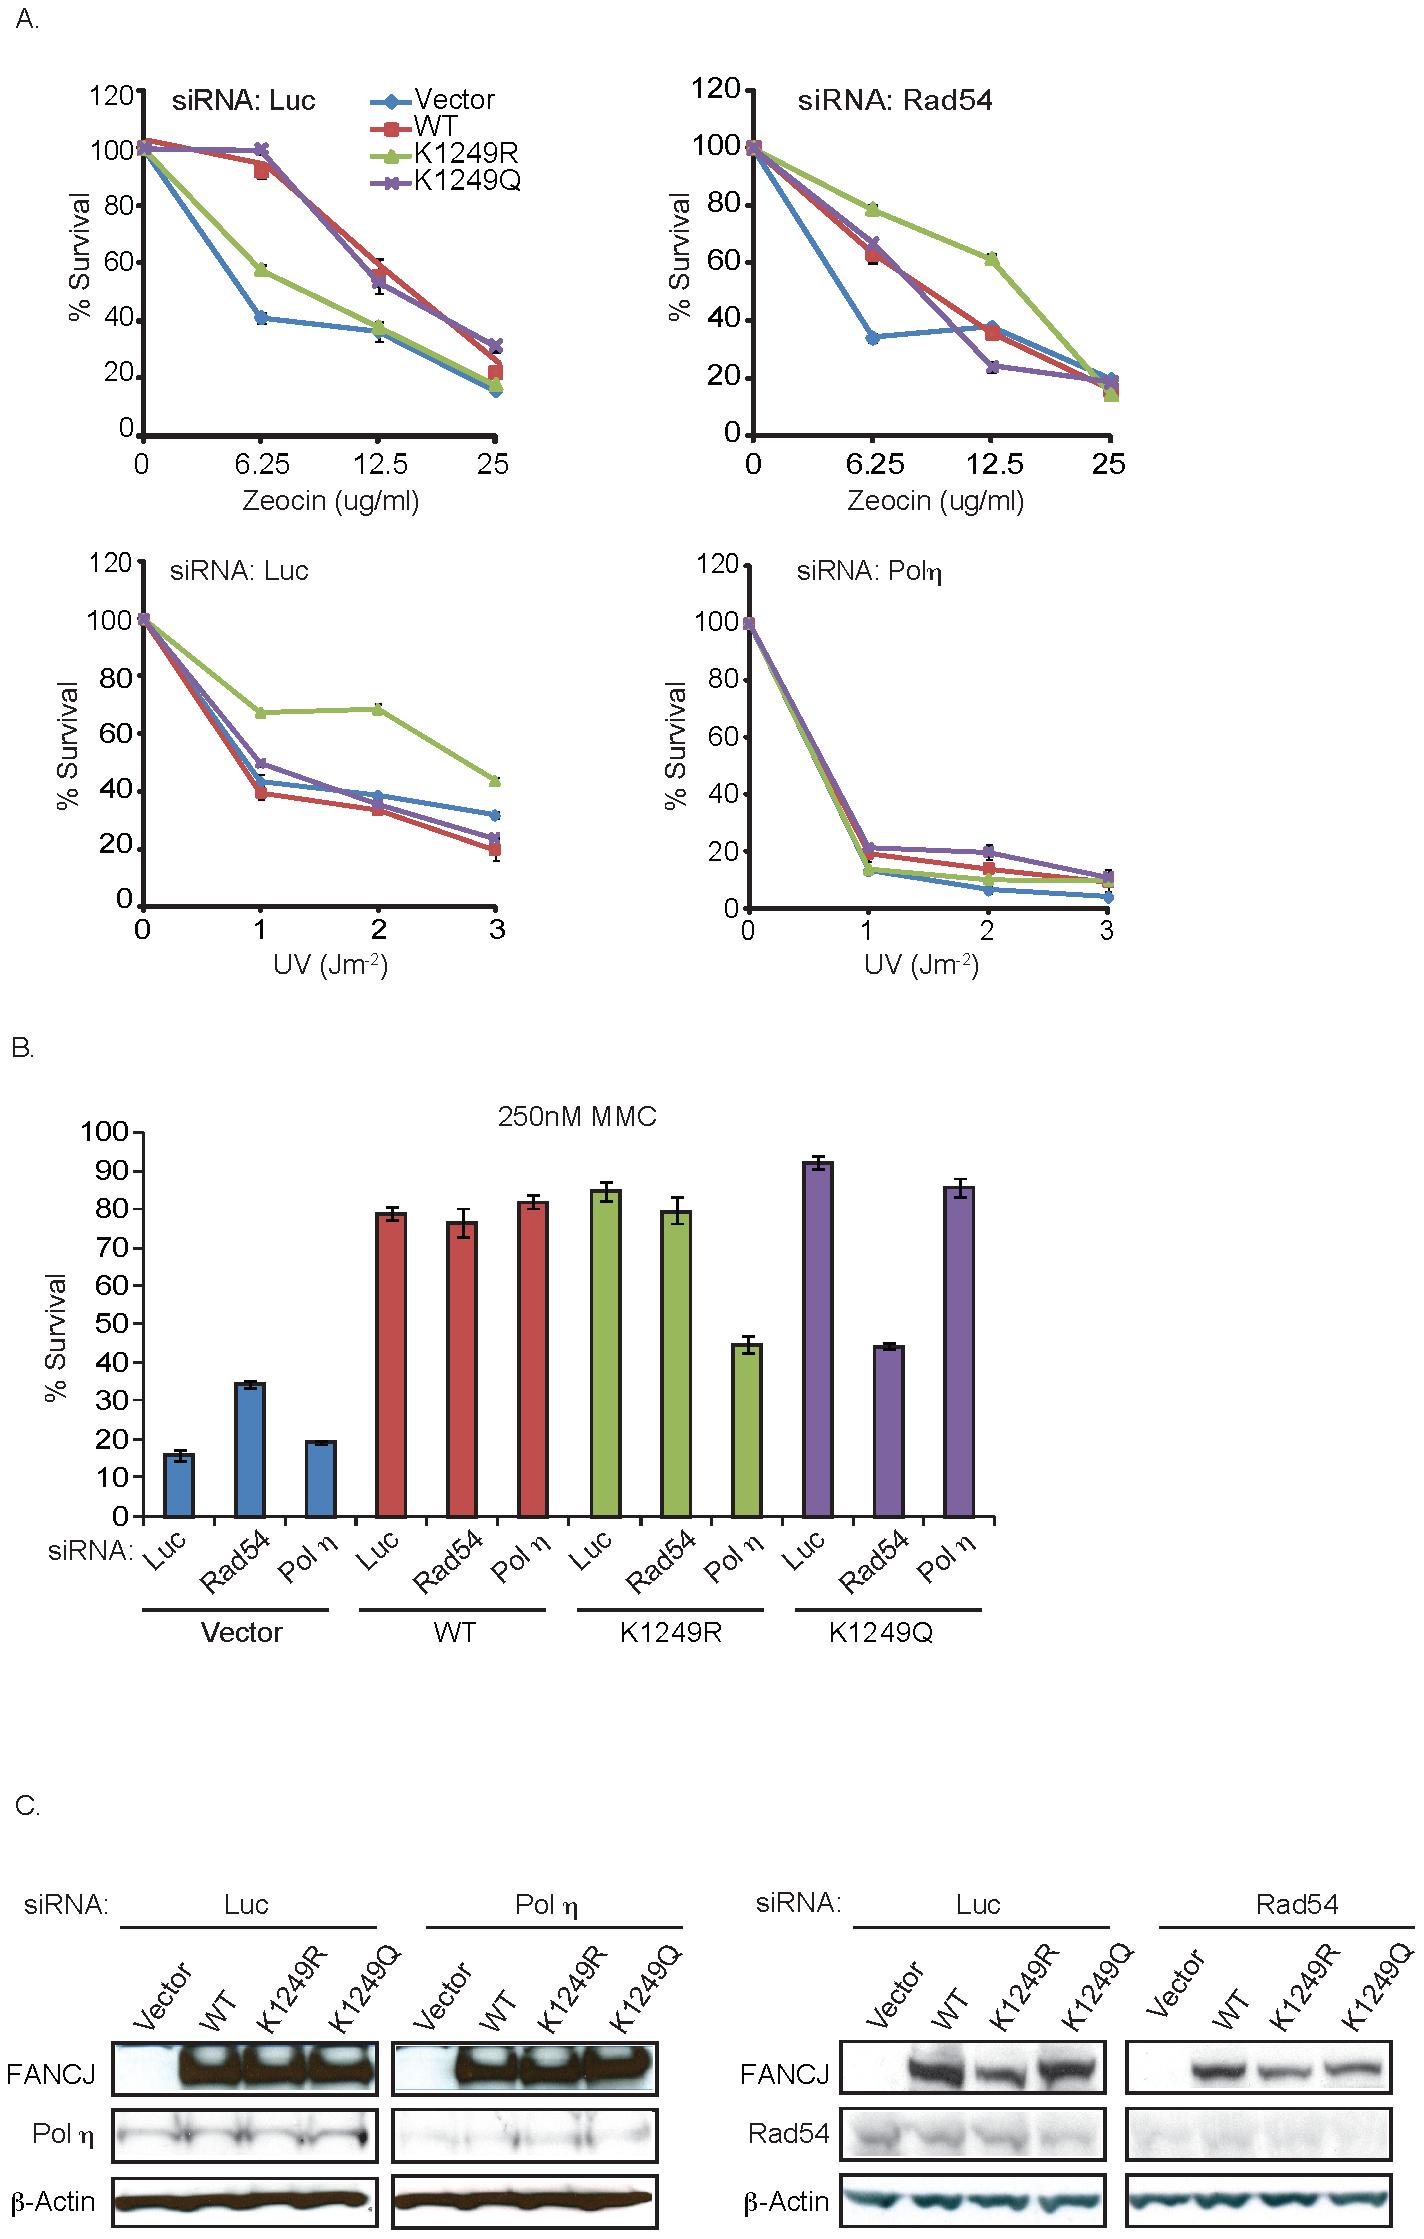 FANCJ<sup>K1249R</sup> or FANCJ<sup>K1249Q</sup> promotes polη- or Rad54-dependent repair, respectively.